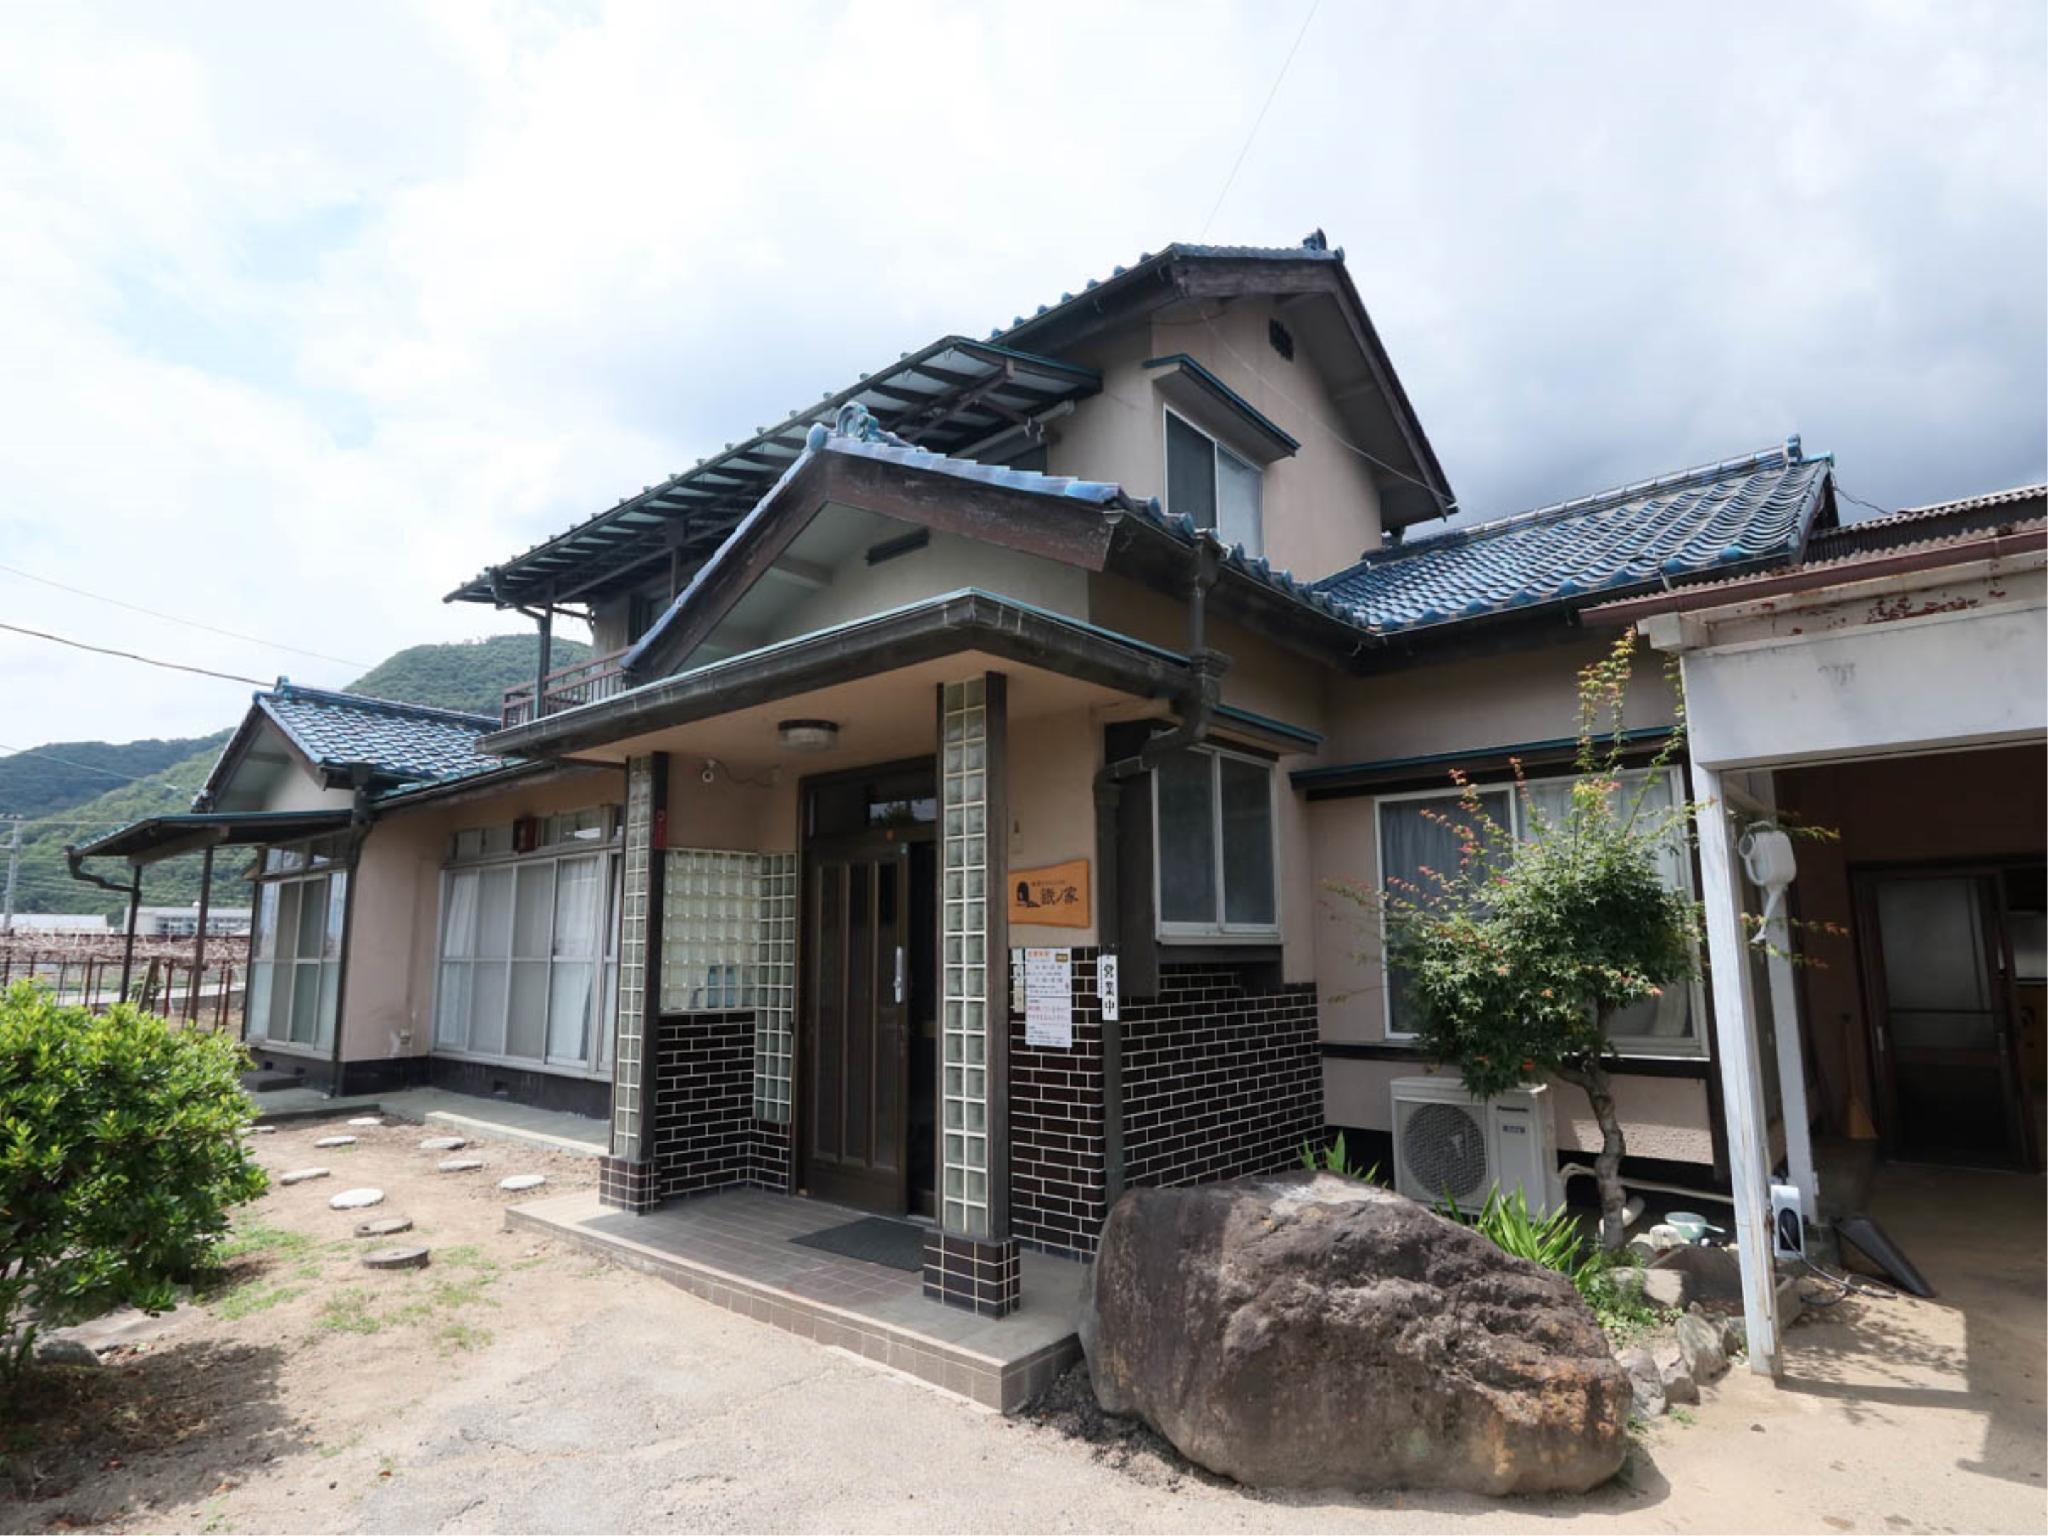 Tetsu No YA Guesthouse For Railfans